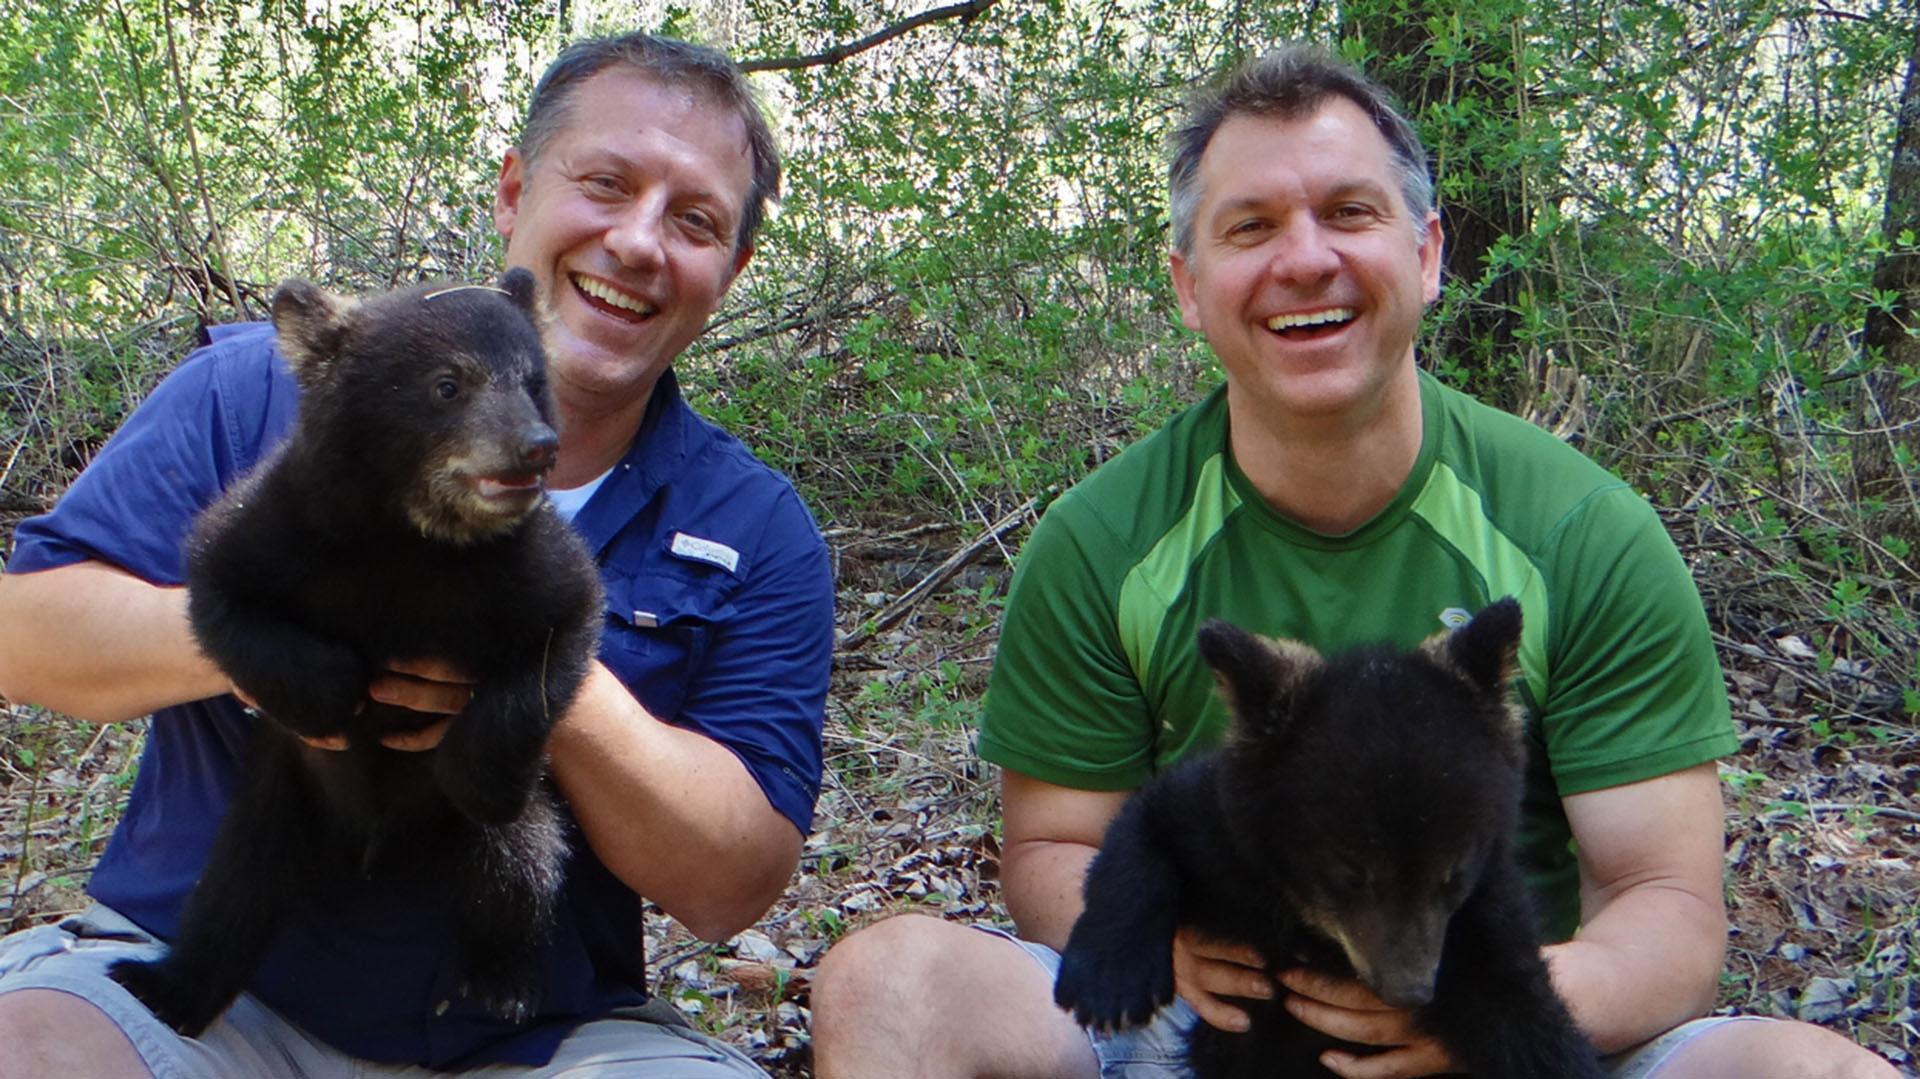 Meet Chris & Martin Kratt, Hosts of Wild Alaska Live